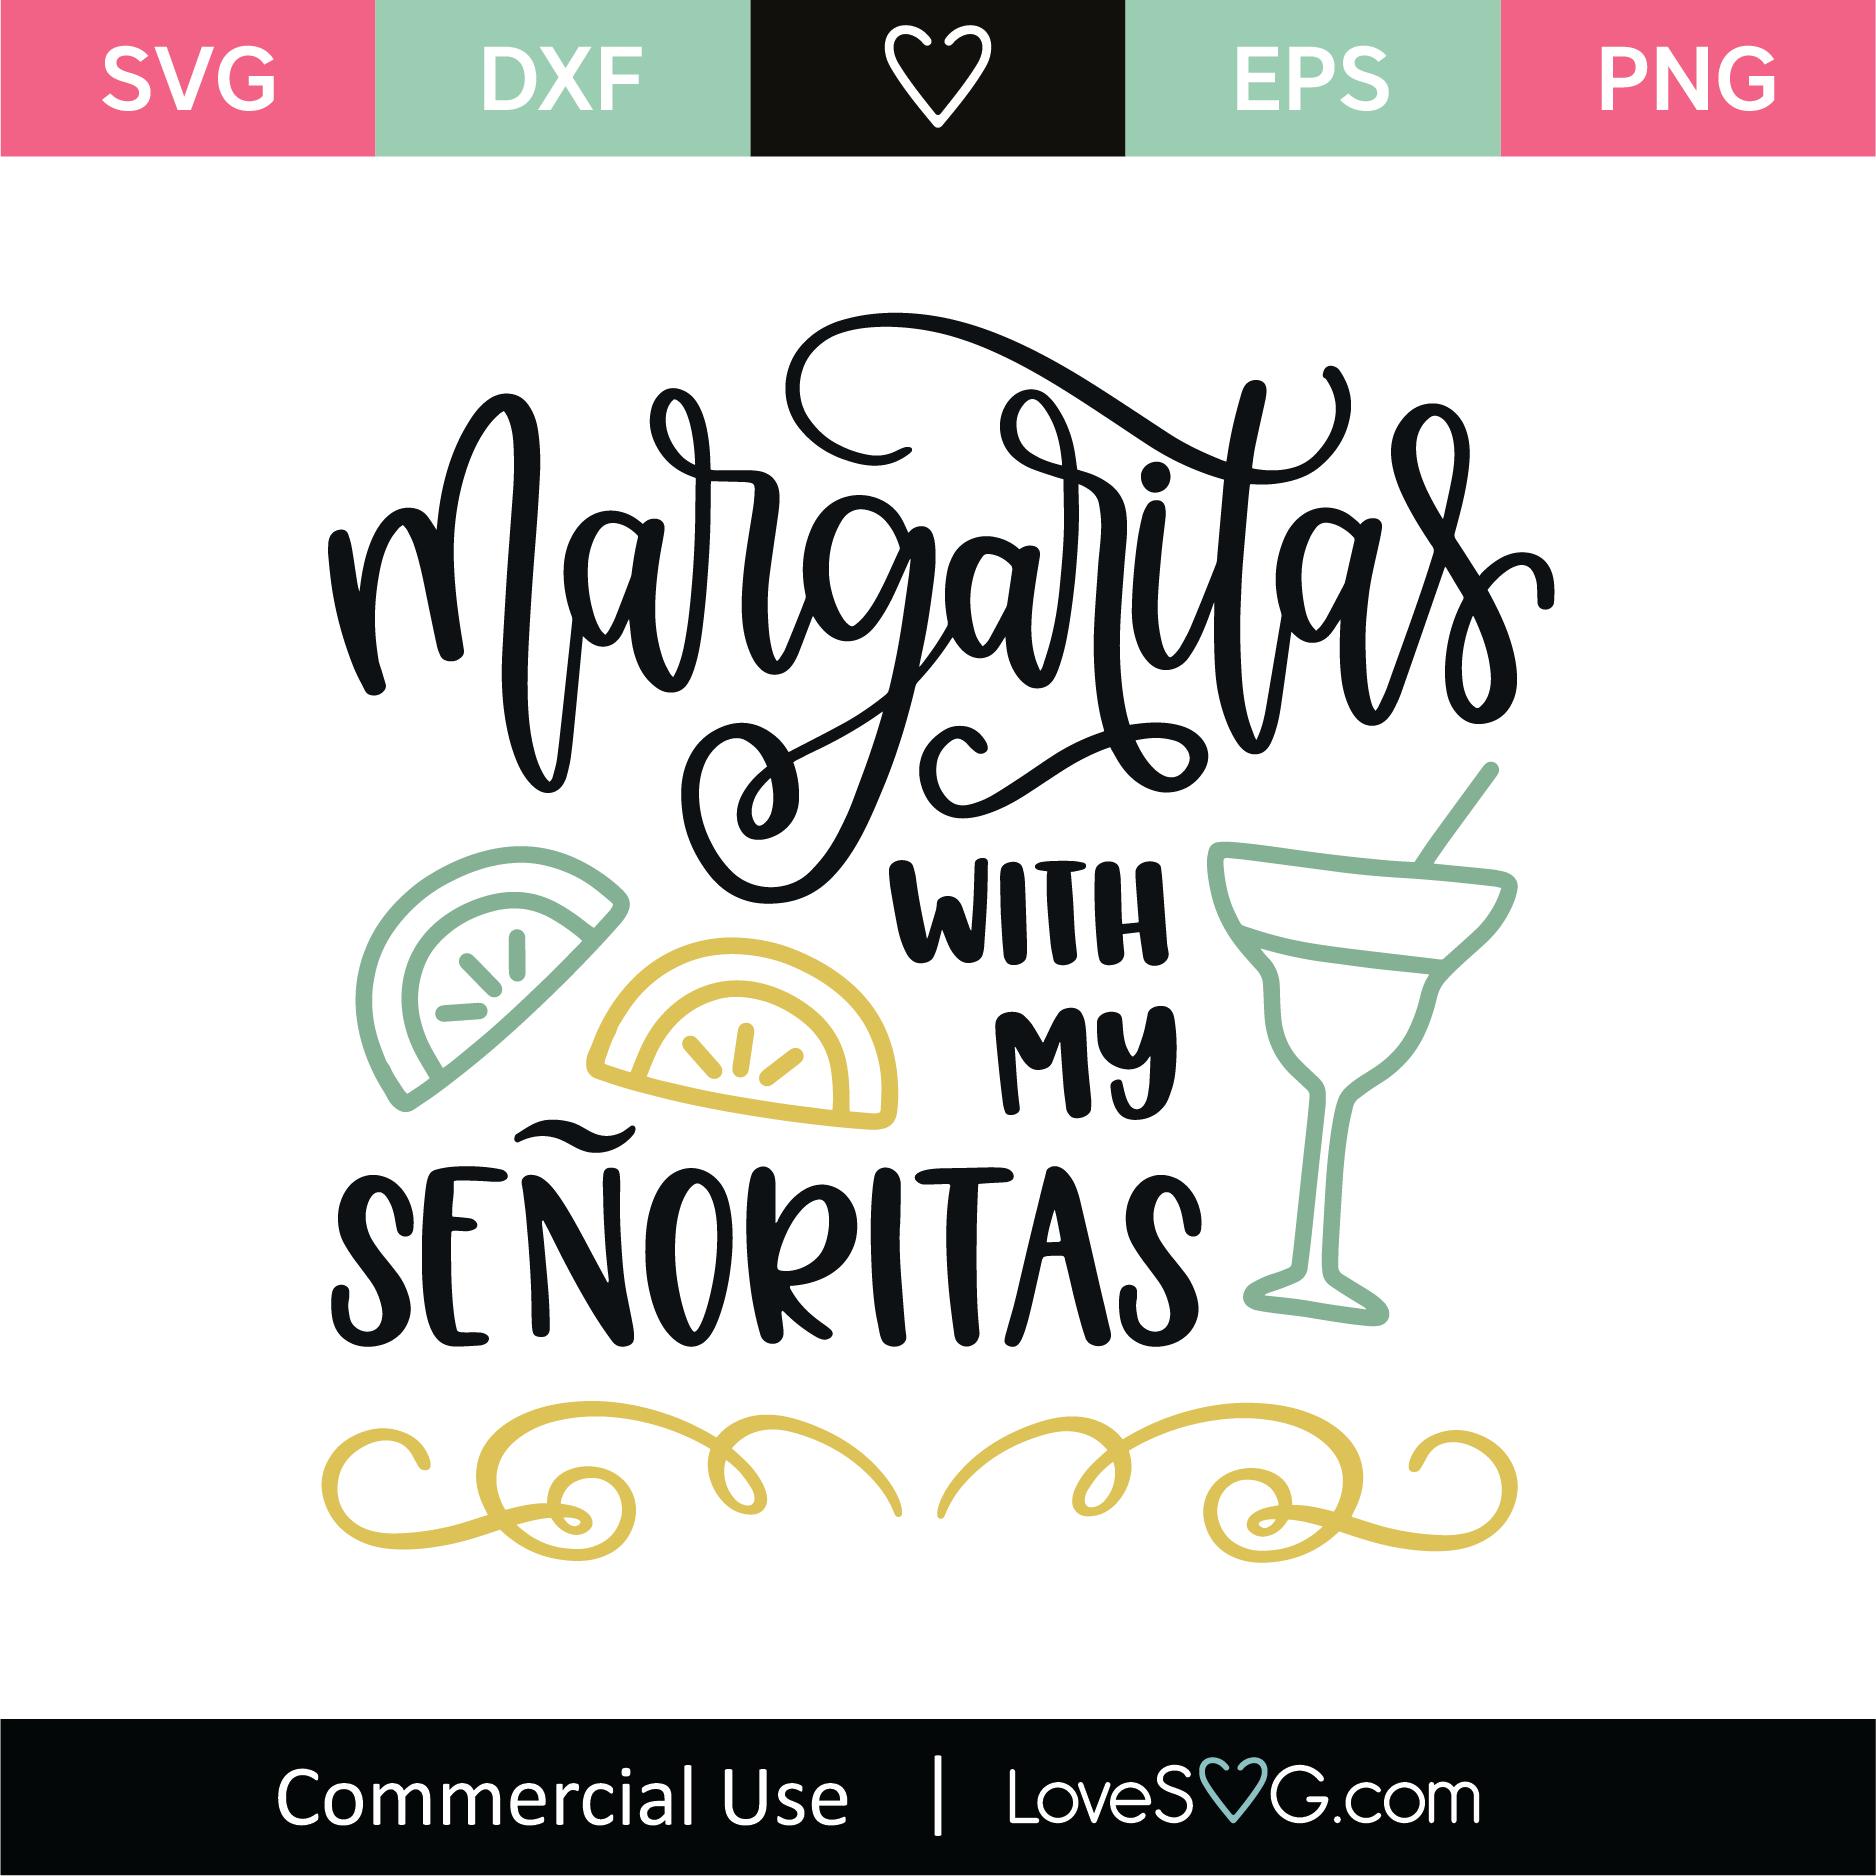 Margaritas With My Senoritas Svg Cut File Lovesvg Com